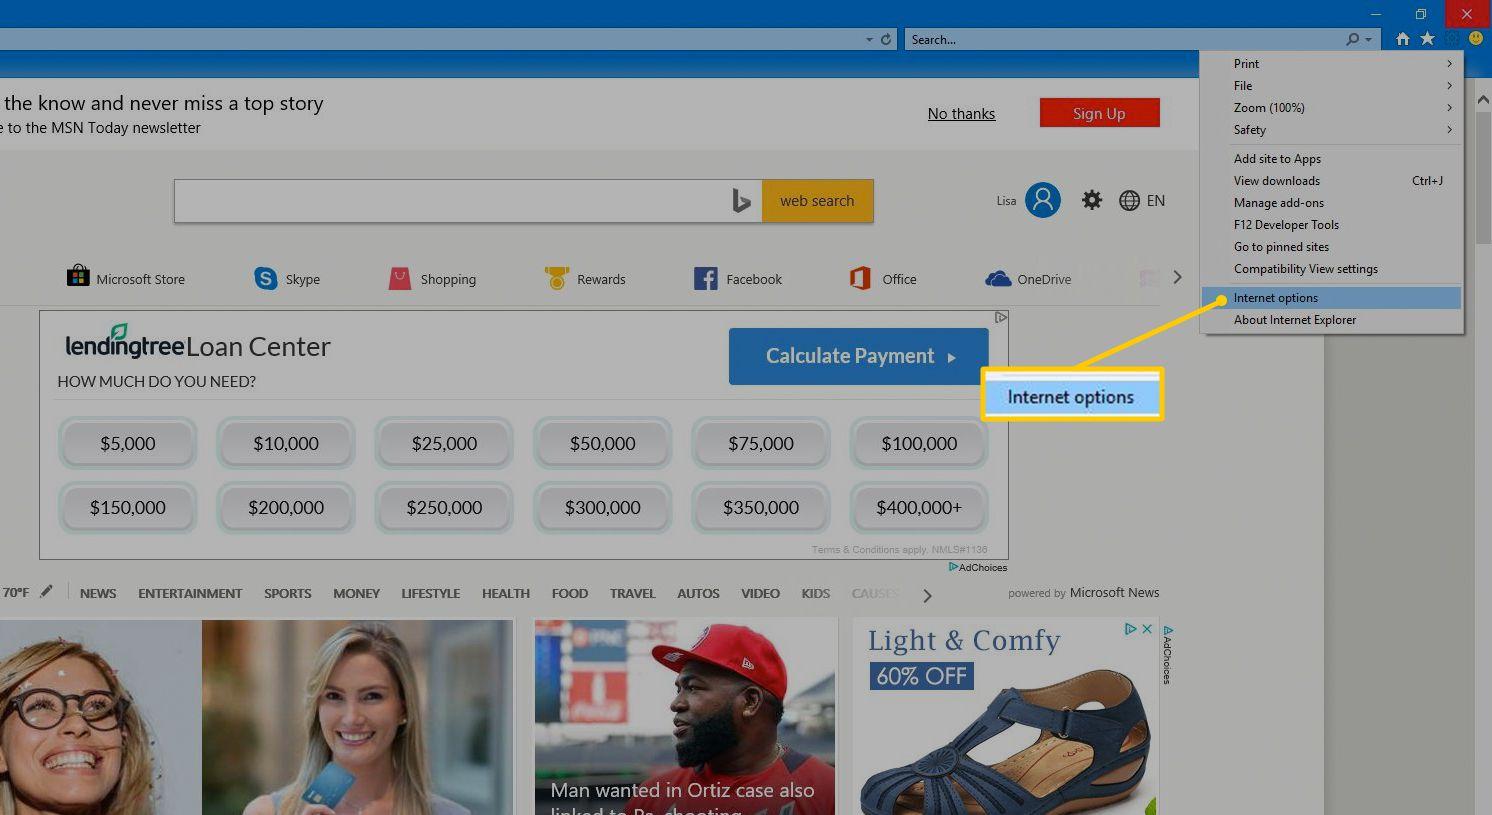 Internet options menu item in Internet Explorer